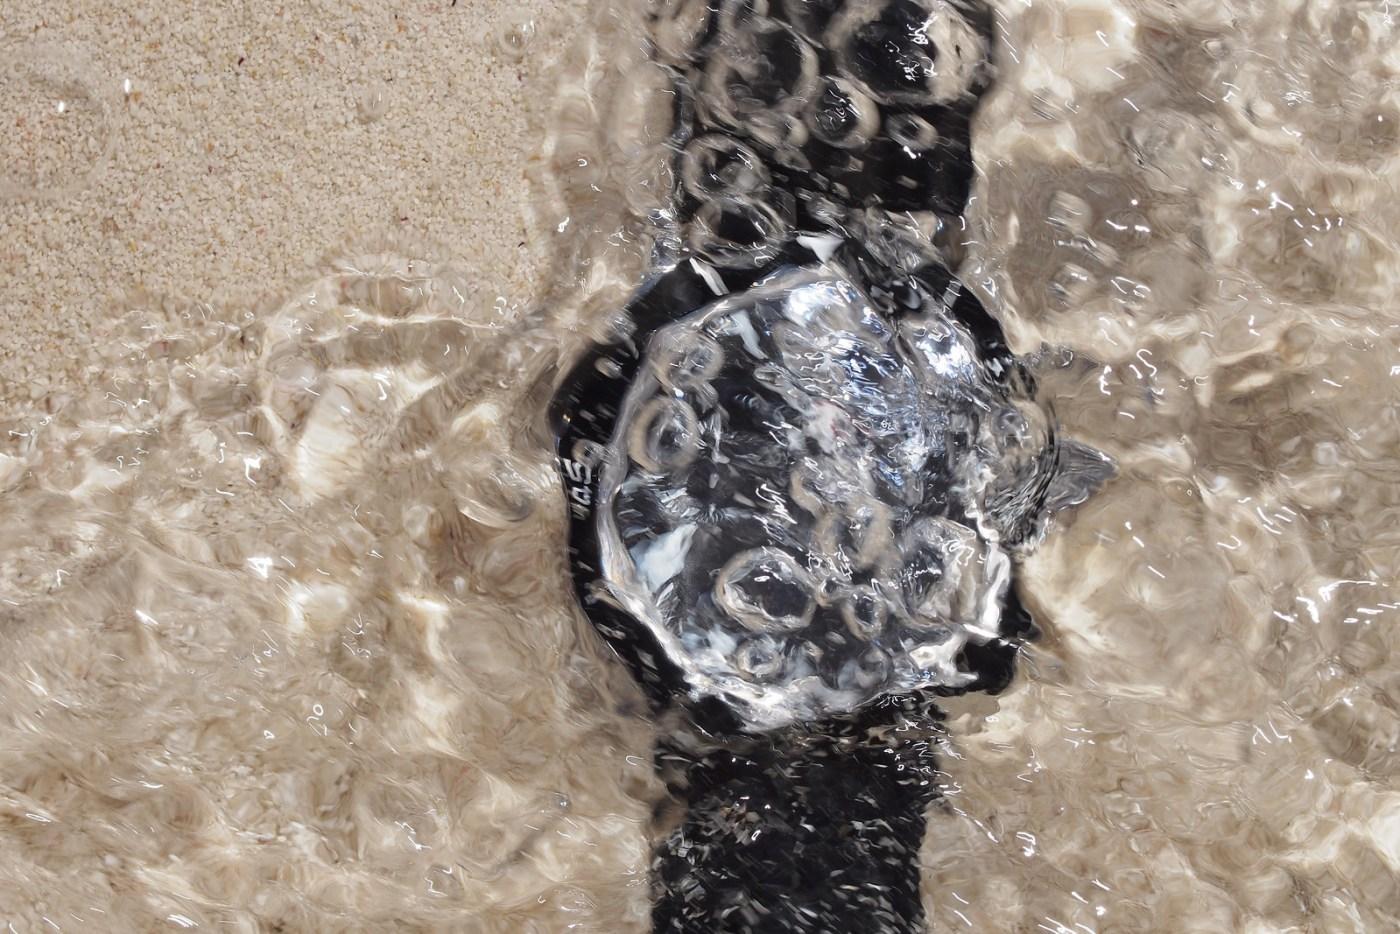 Jaeger-LeCoultre Deep Sea Chronograph underwater